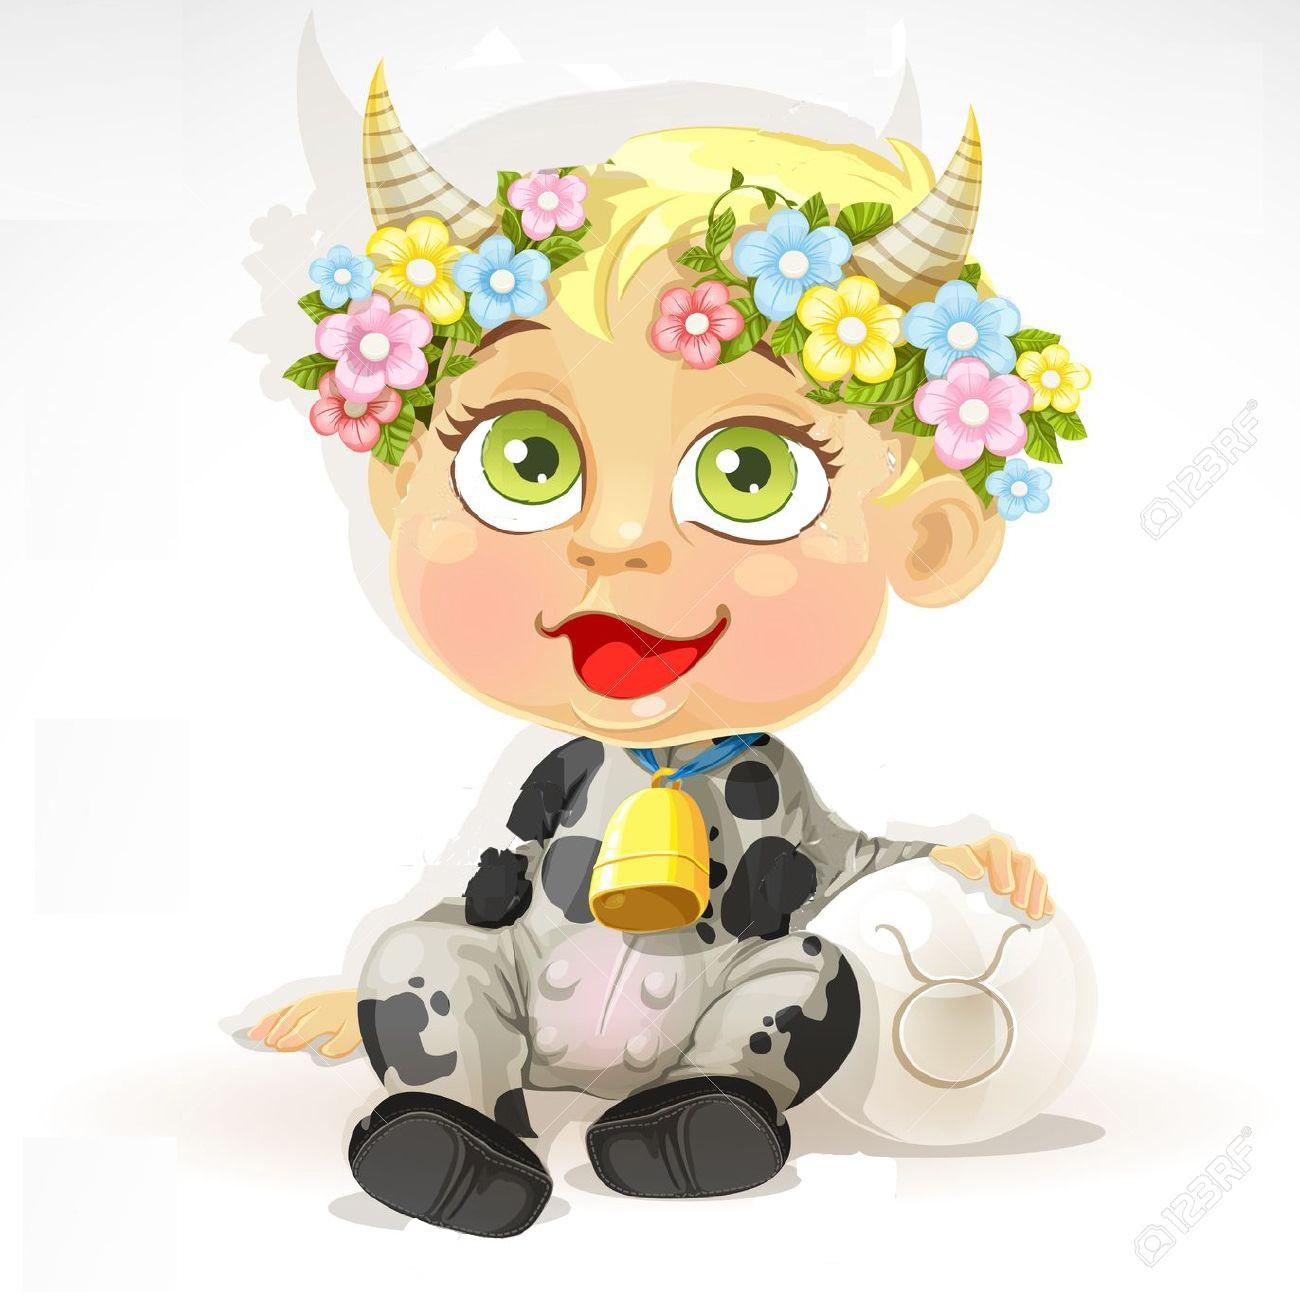 Baby-zodiac-sign-Taurus-Stock-Vector